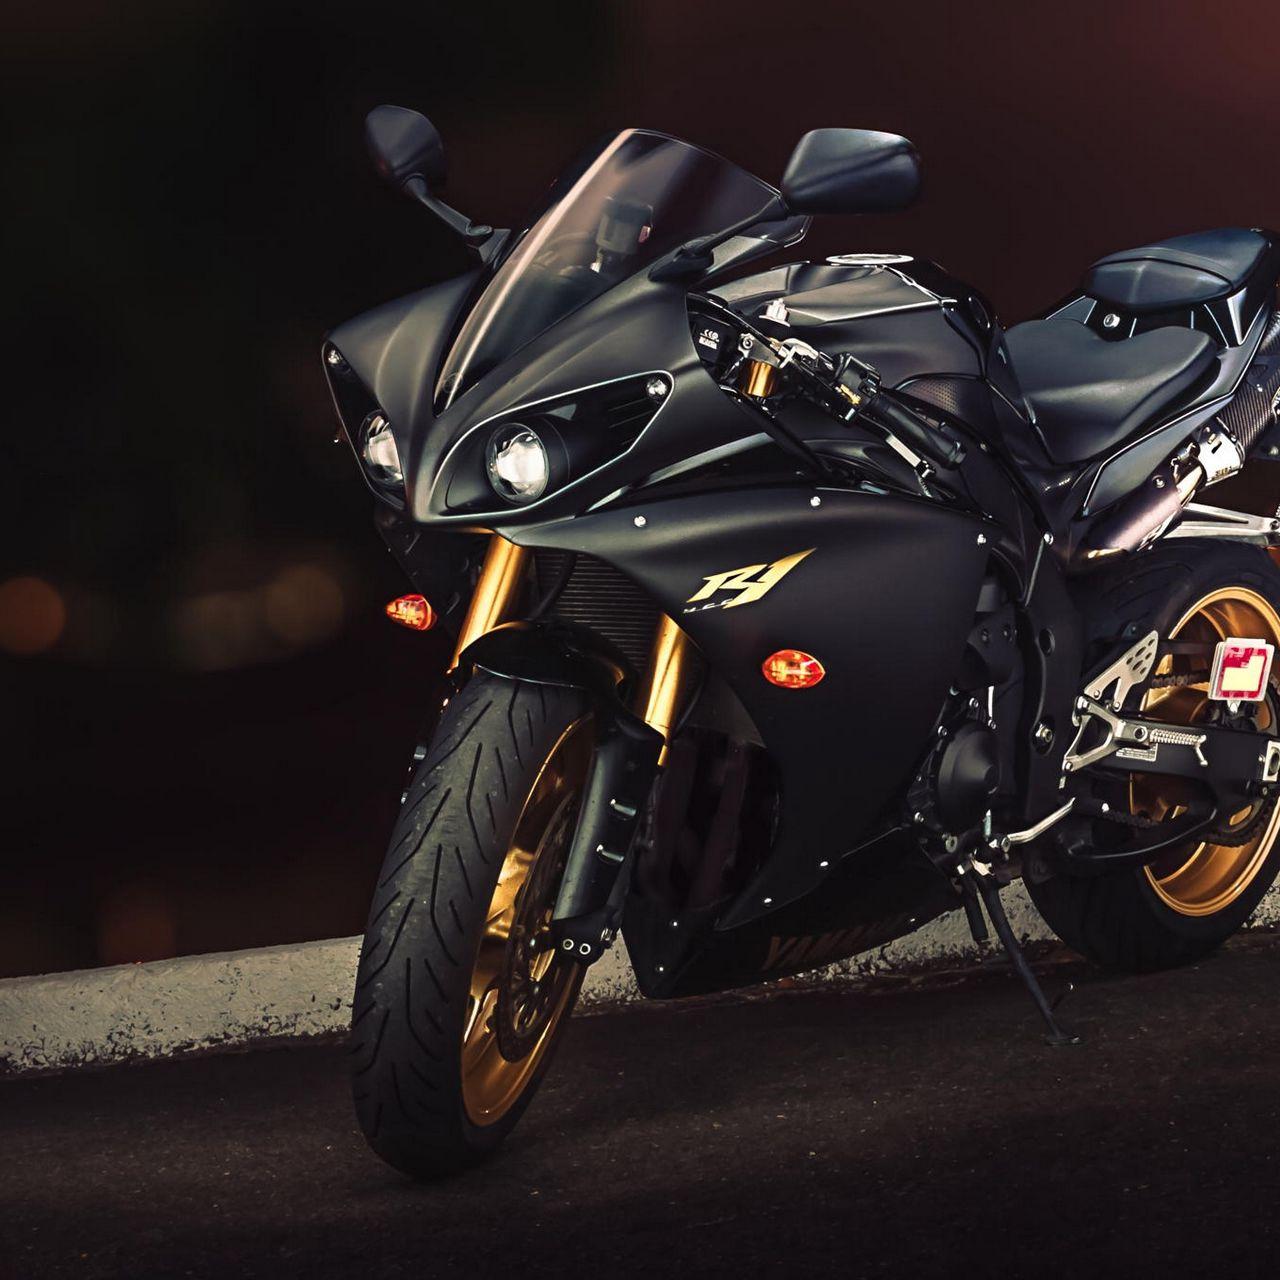 1280x1280 Wallpaper yamaha, yzf-r1, sport bike